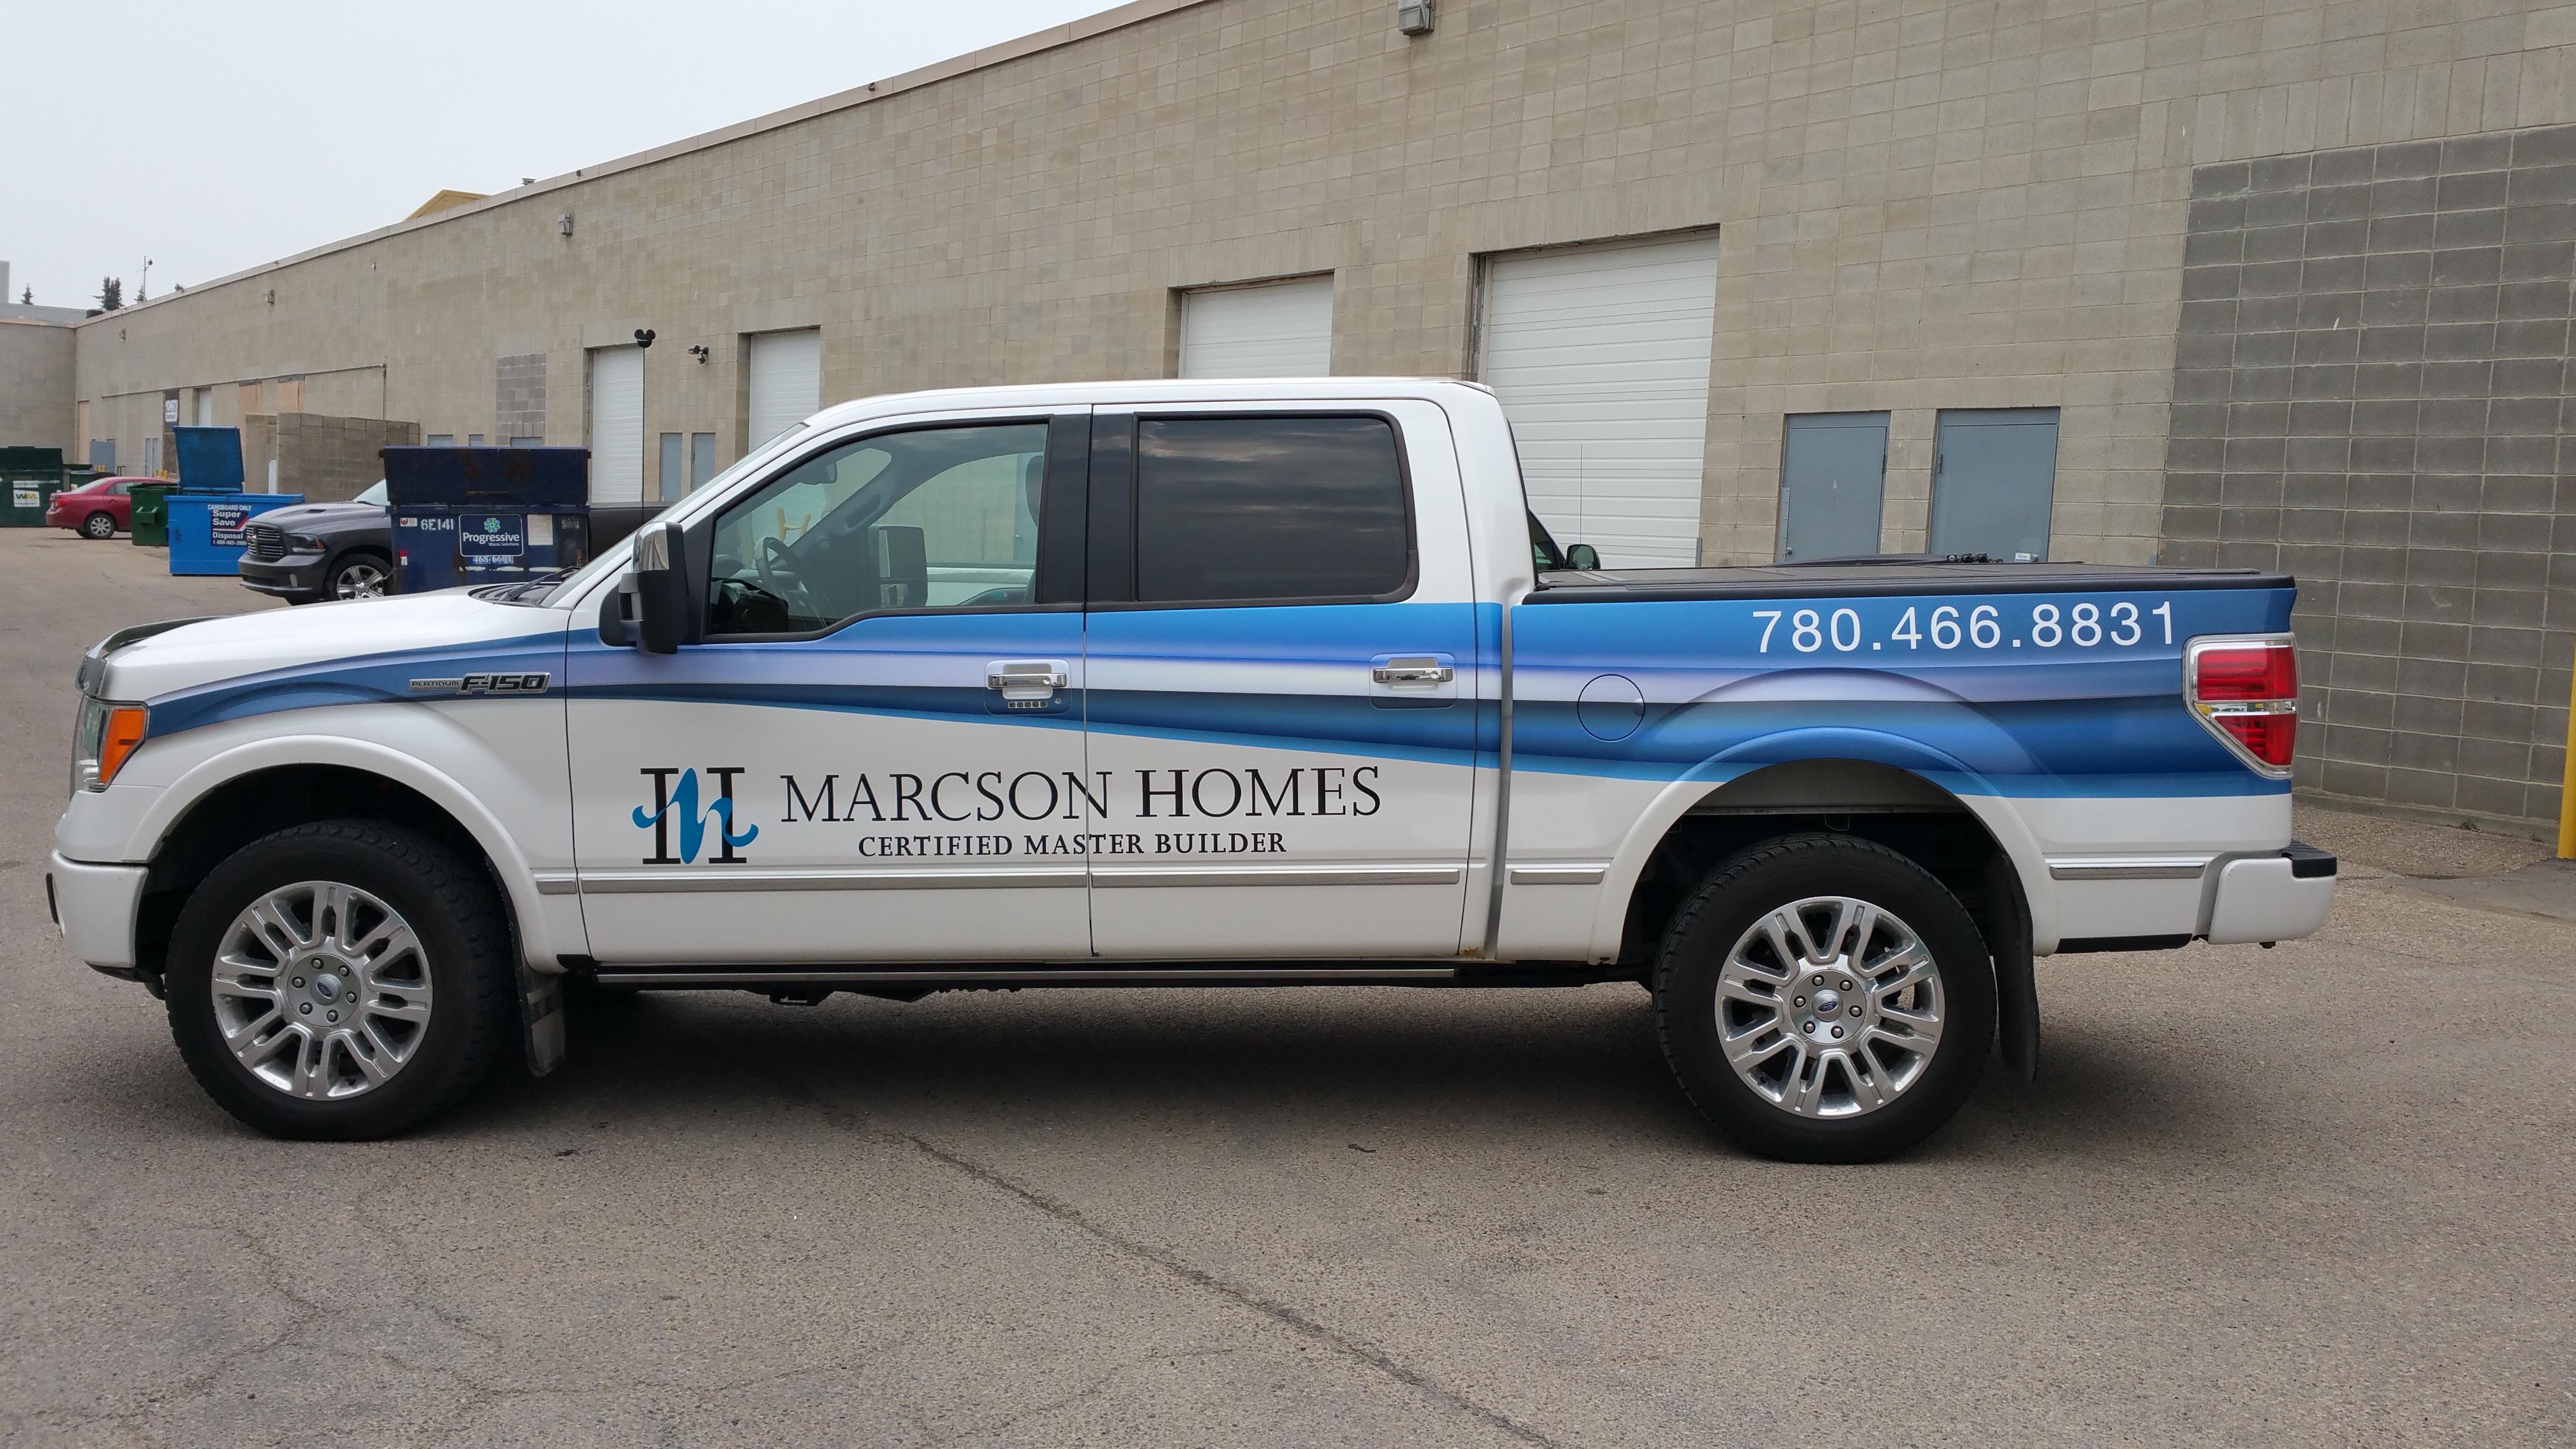 Marcson Homes